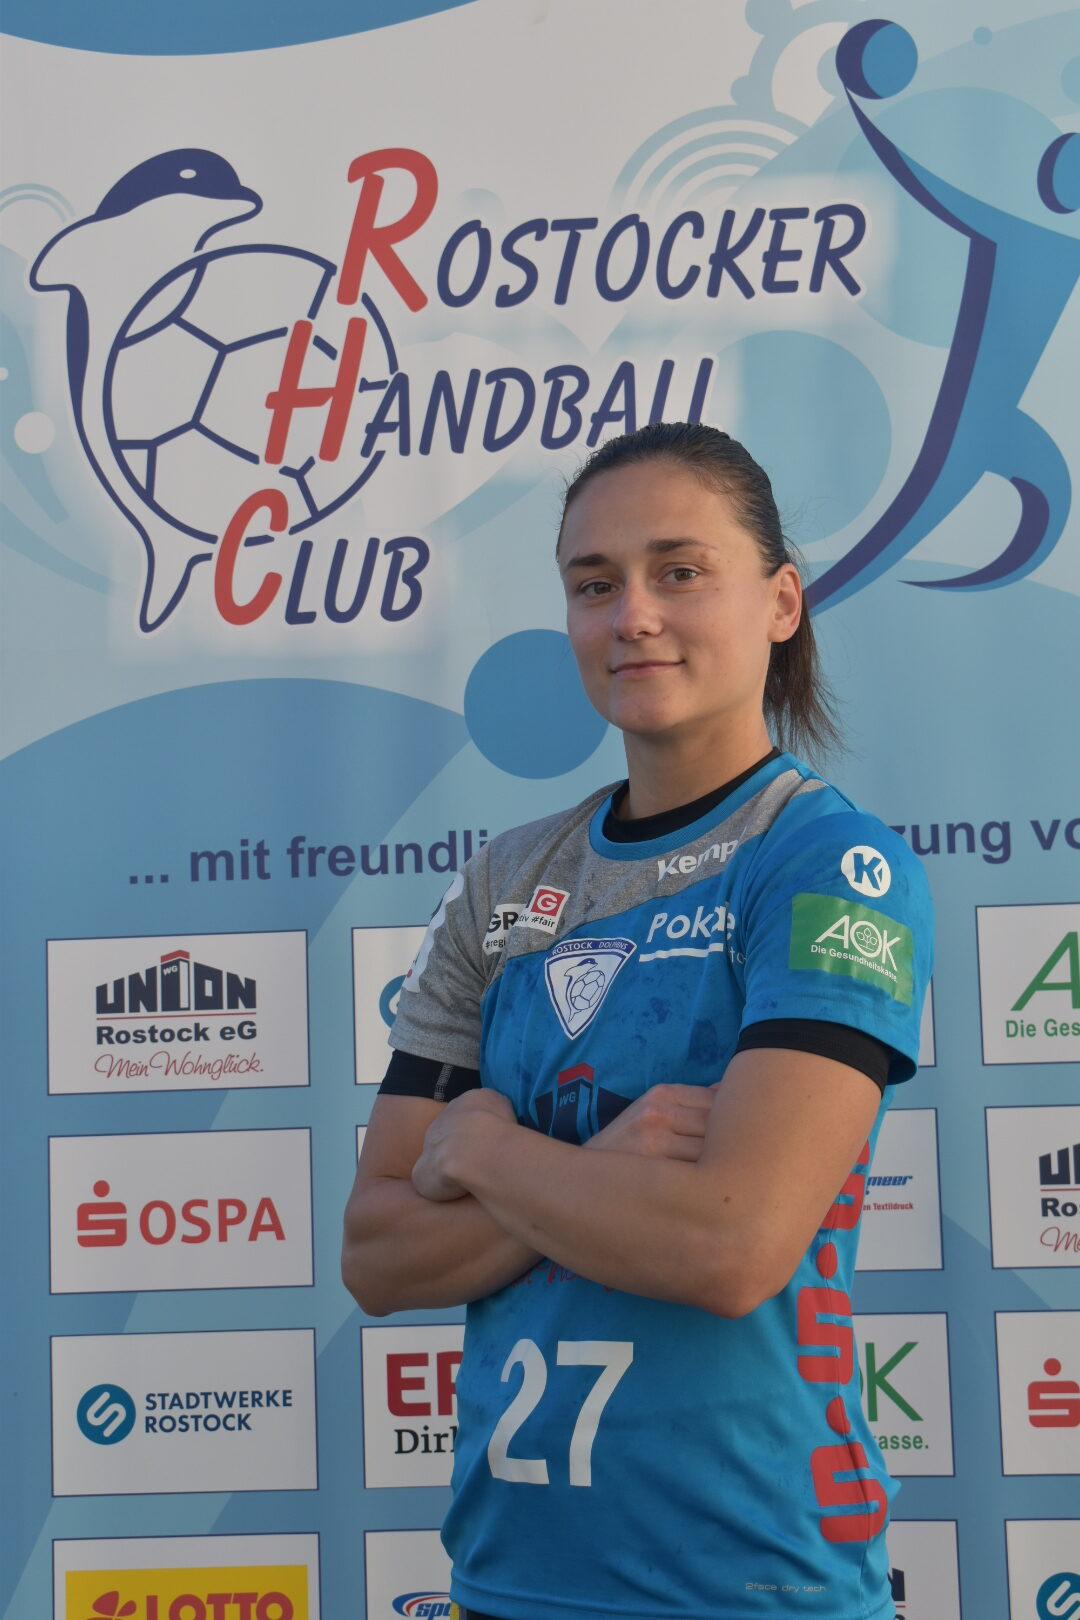 Martina Corkovic